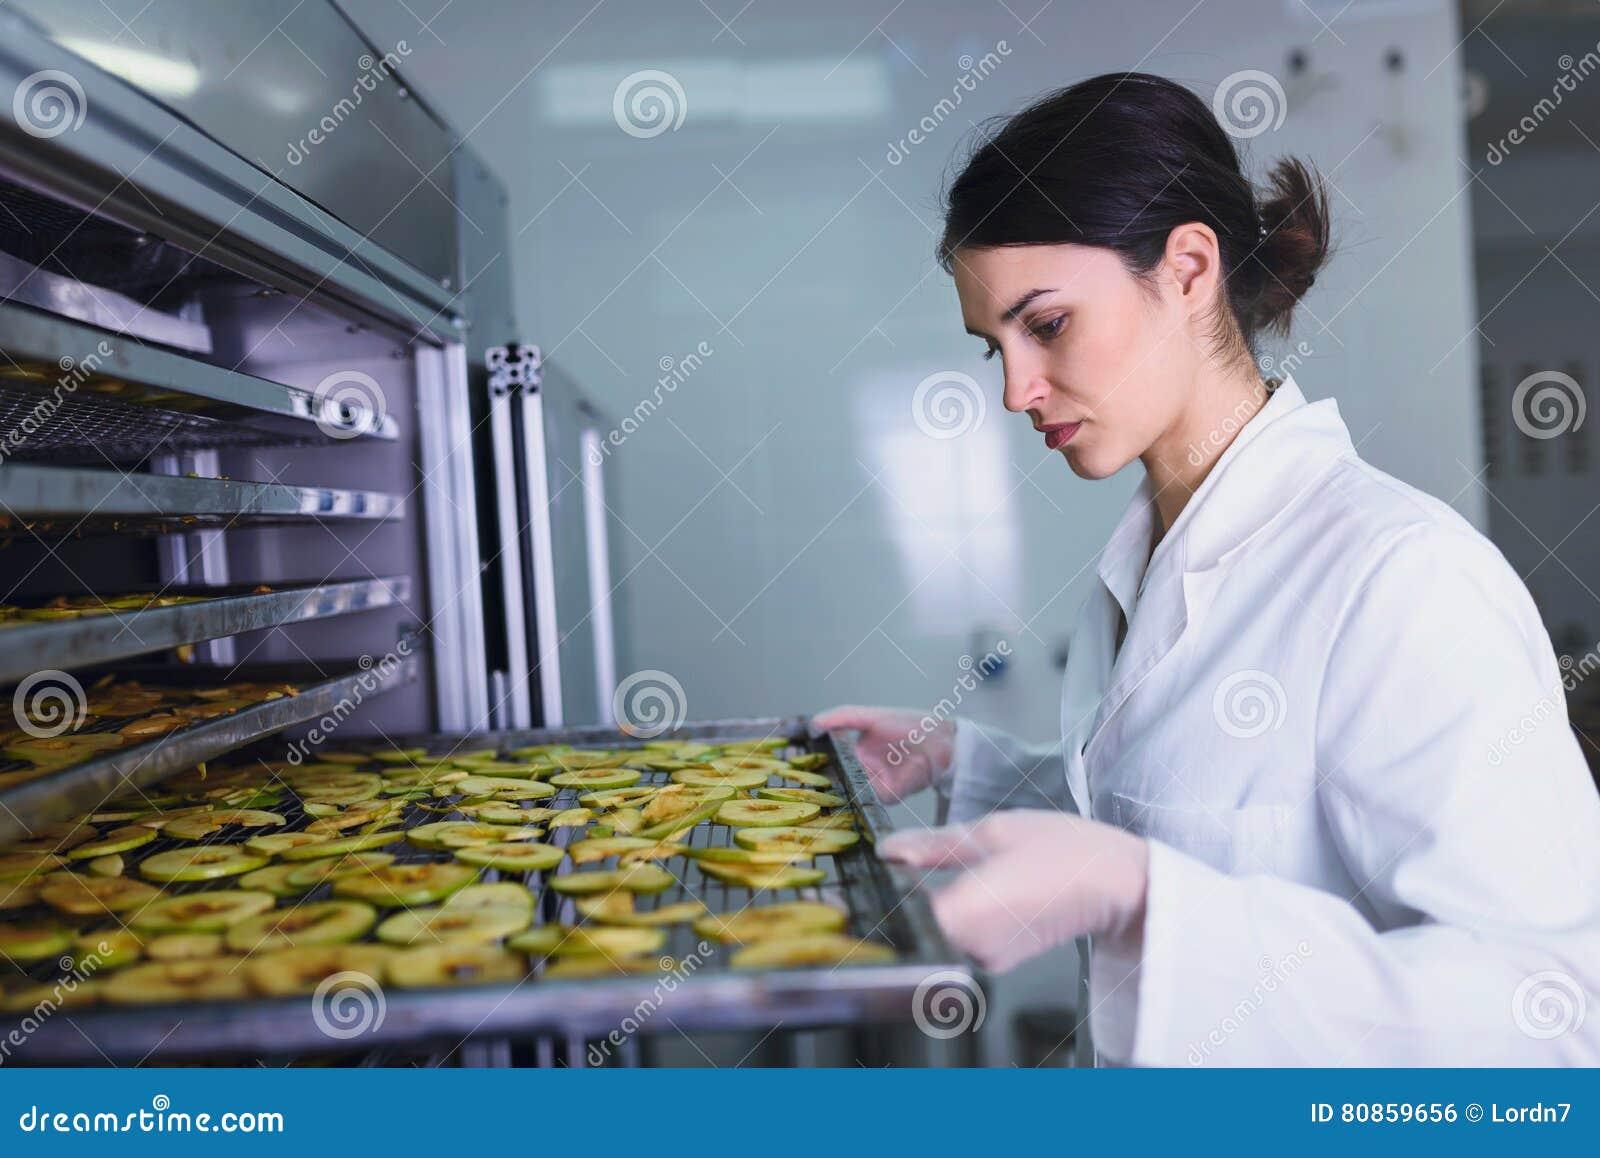 Female worker on food dryer dehydrator machine